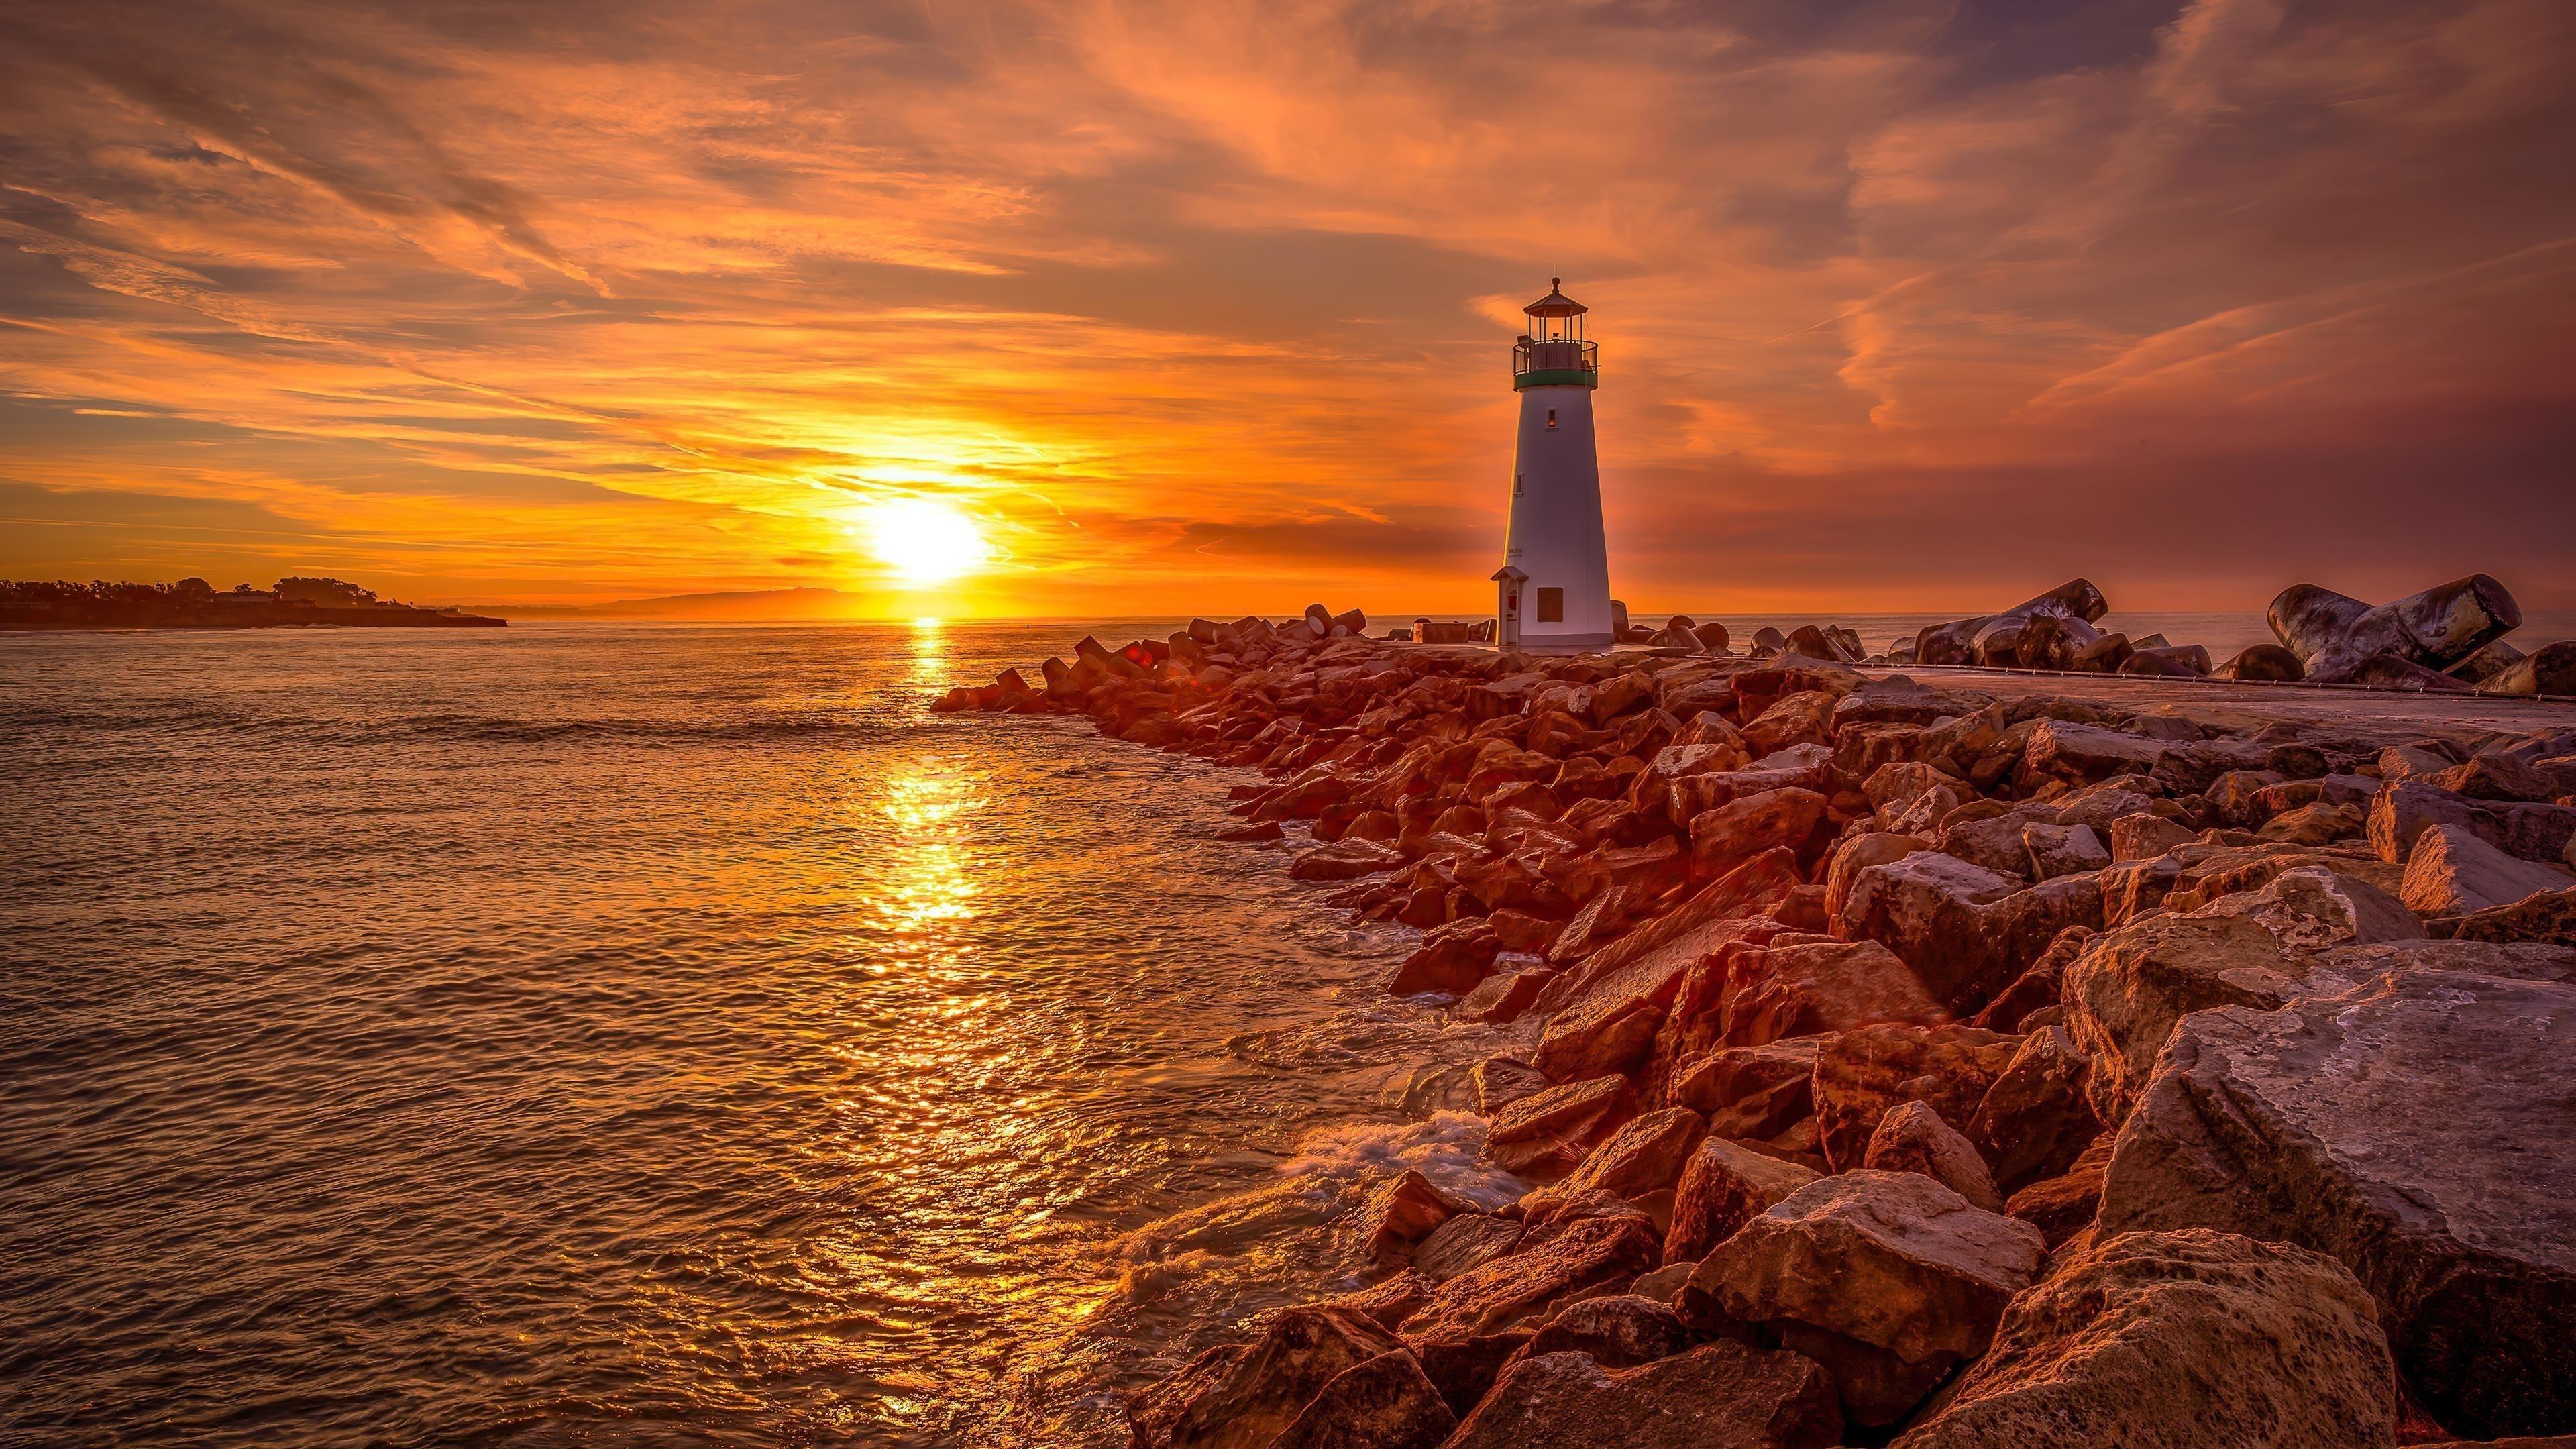 Маяк восход и закат солнца обои скачать